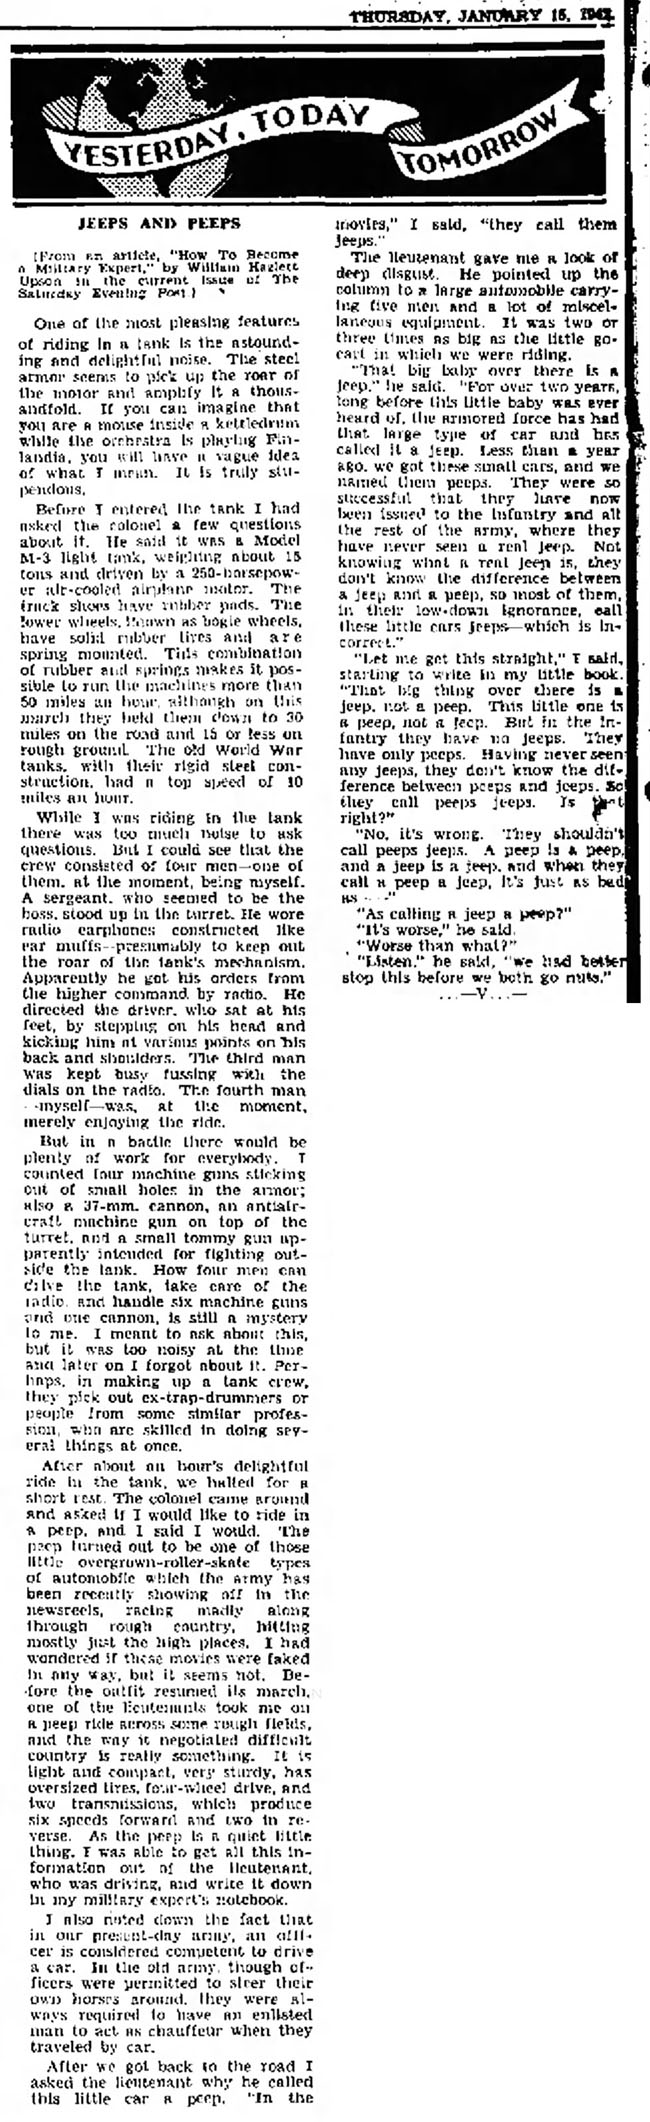 1942-01-15-amarillo-globe-times-peep-jeep-lores